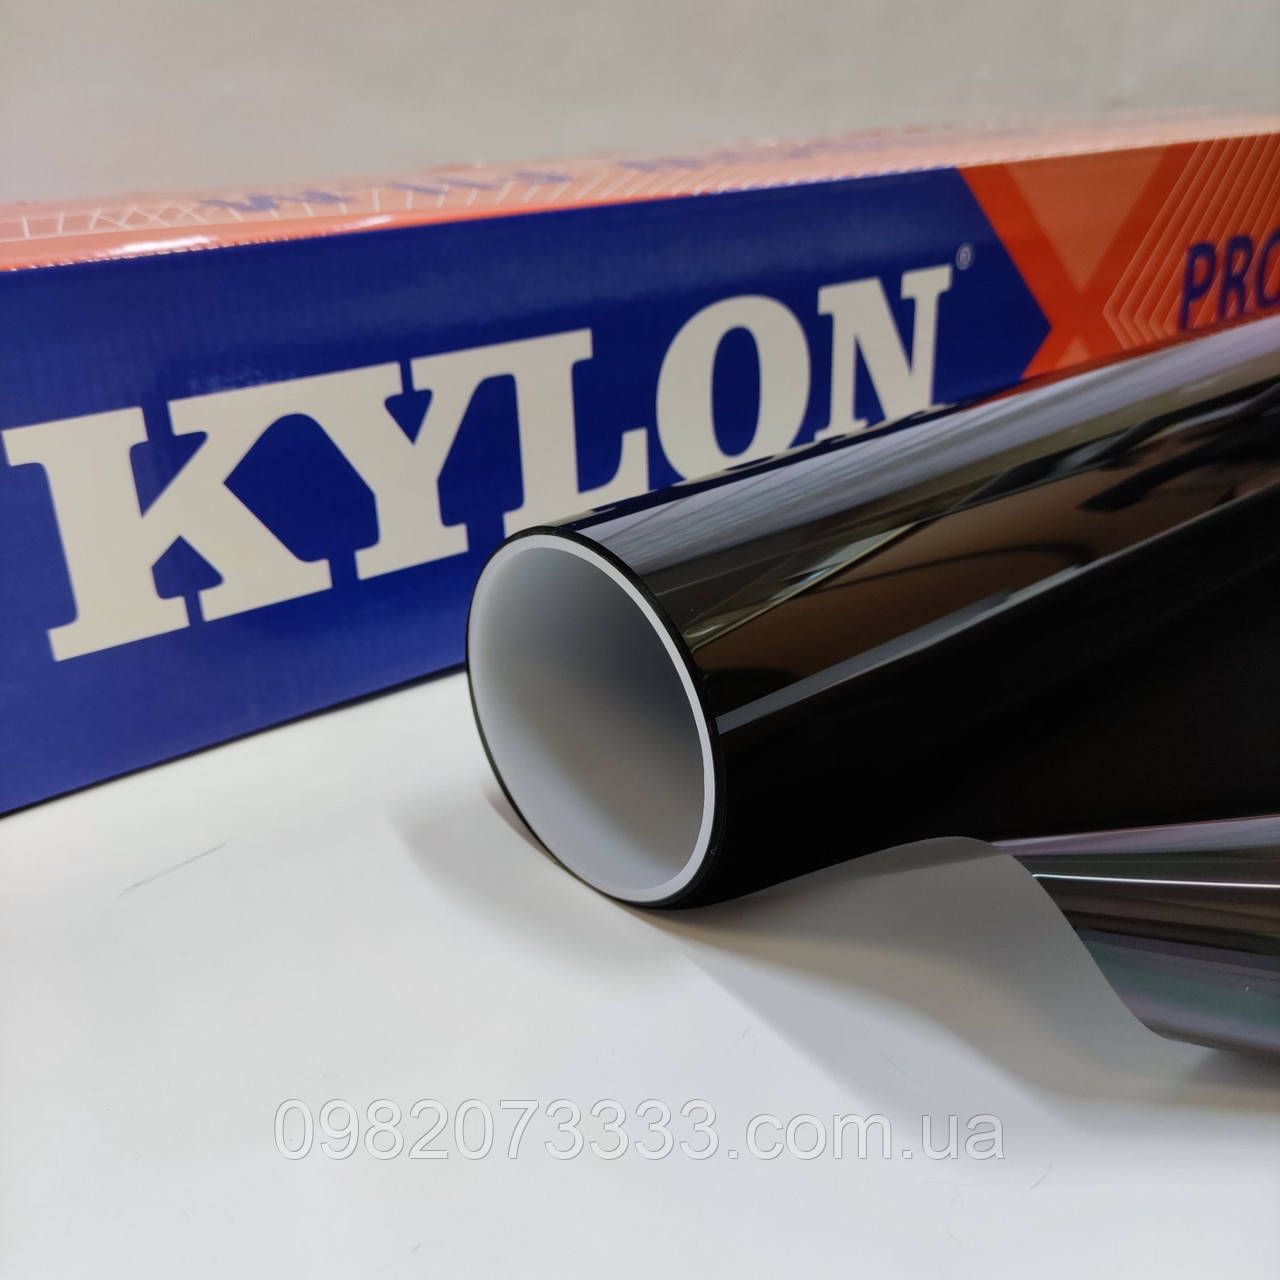 Автомобильная NR Black 15 (цвет: чёрный) тонировочная солнцезащитная плёнка Kylon ширина 1,524 (цена за кв.м.)